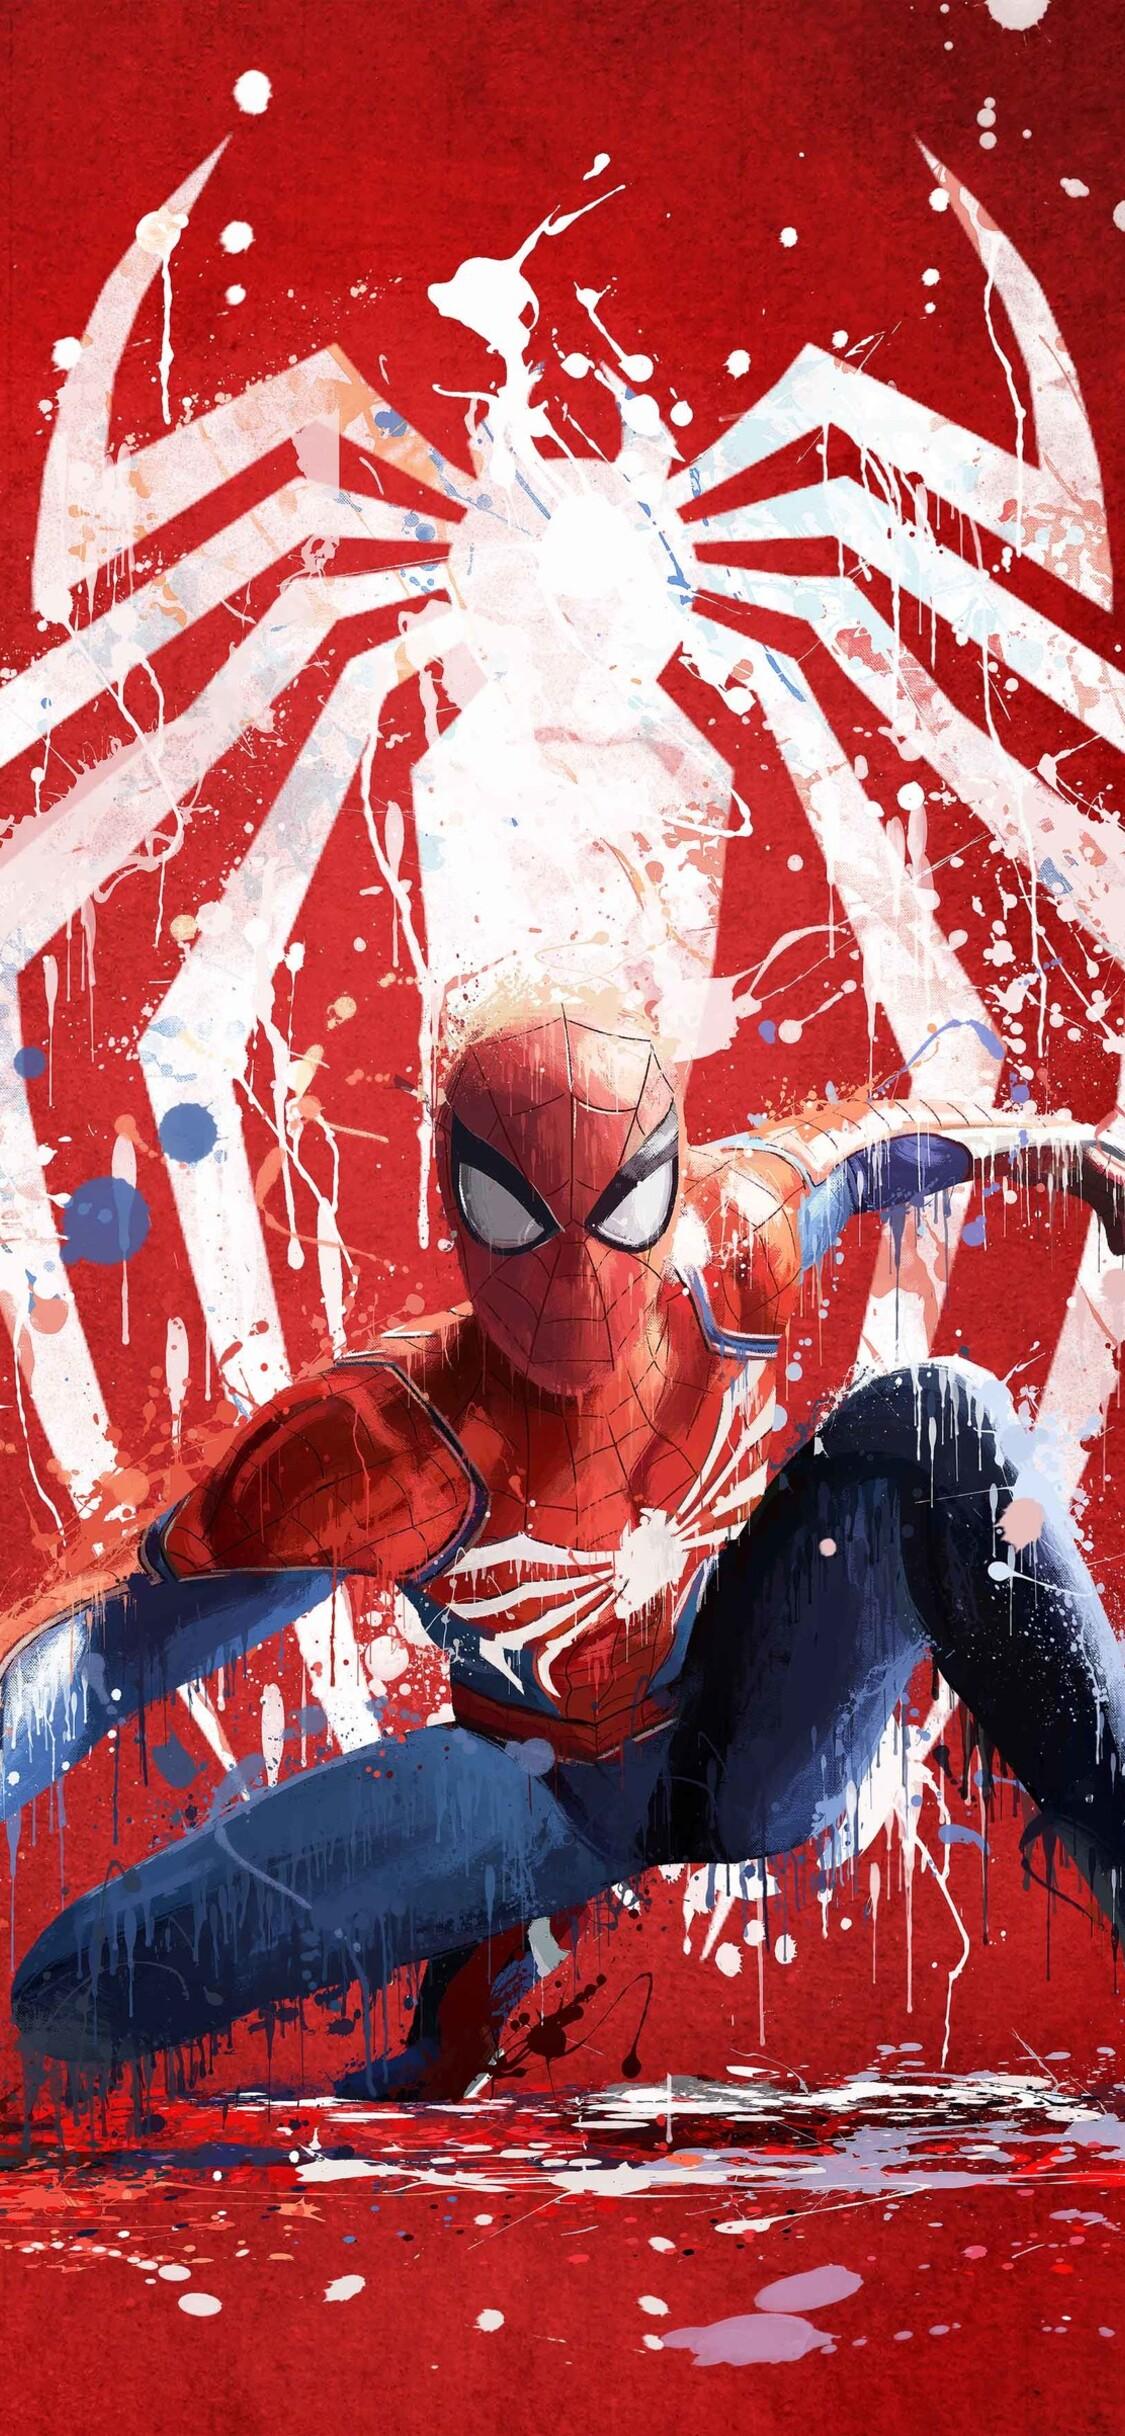 1125x2436 spiderman ps4 art 2018 iphone xs iphone 10 - Spiderman iphone x wallpaper ...